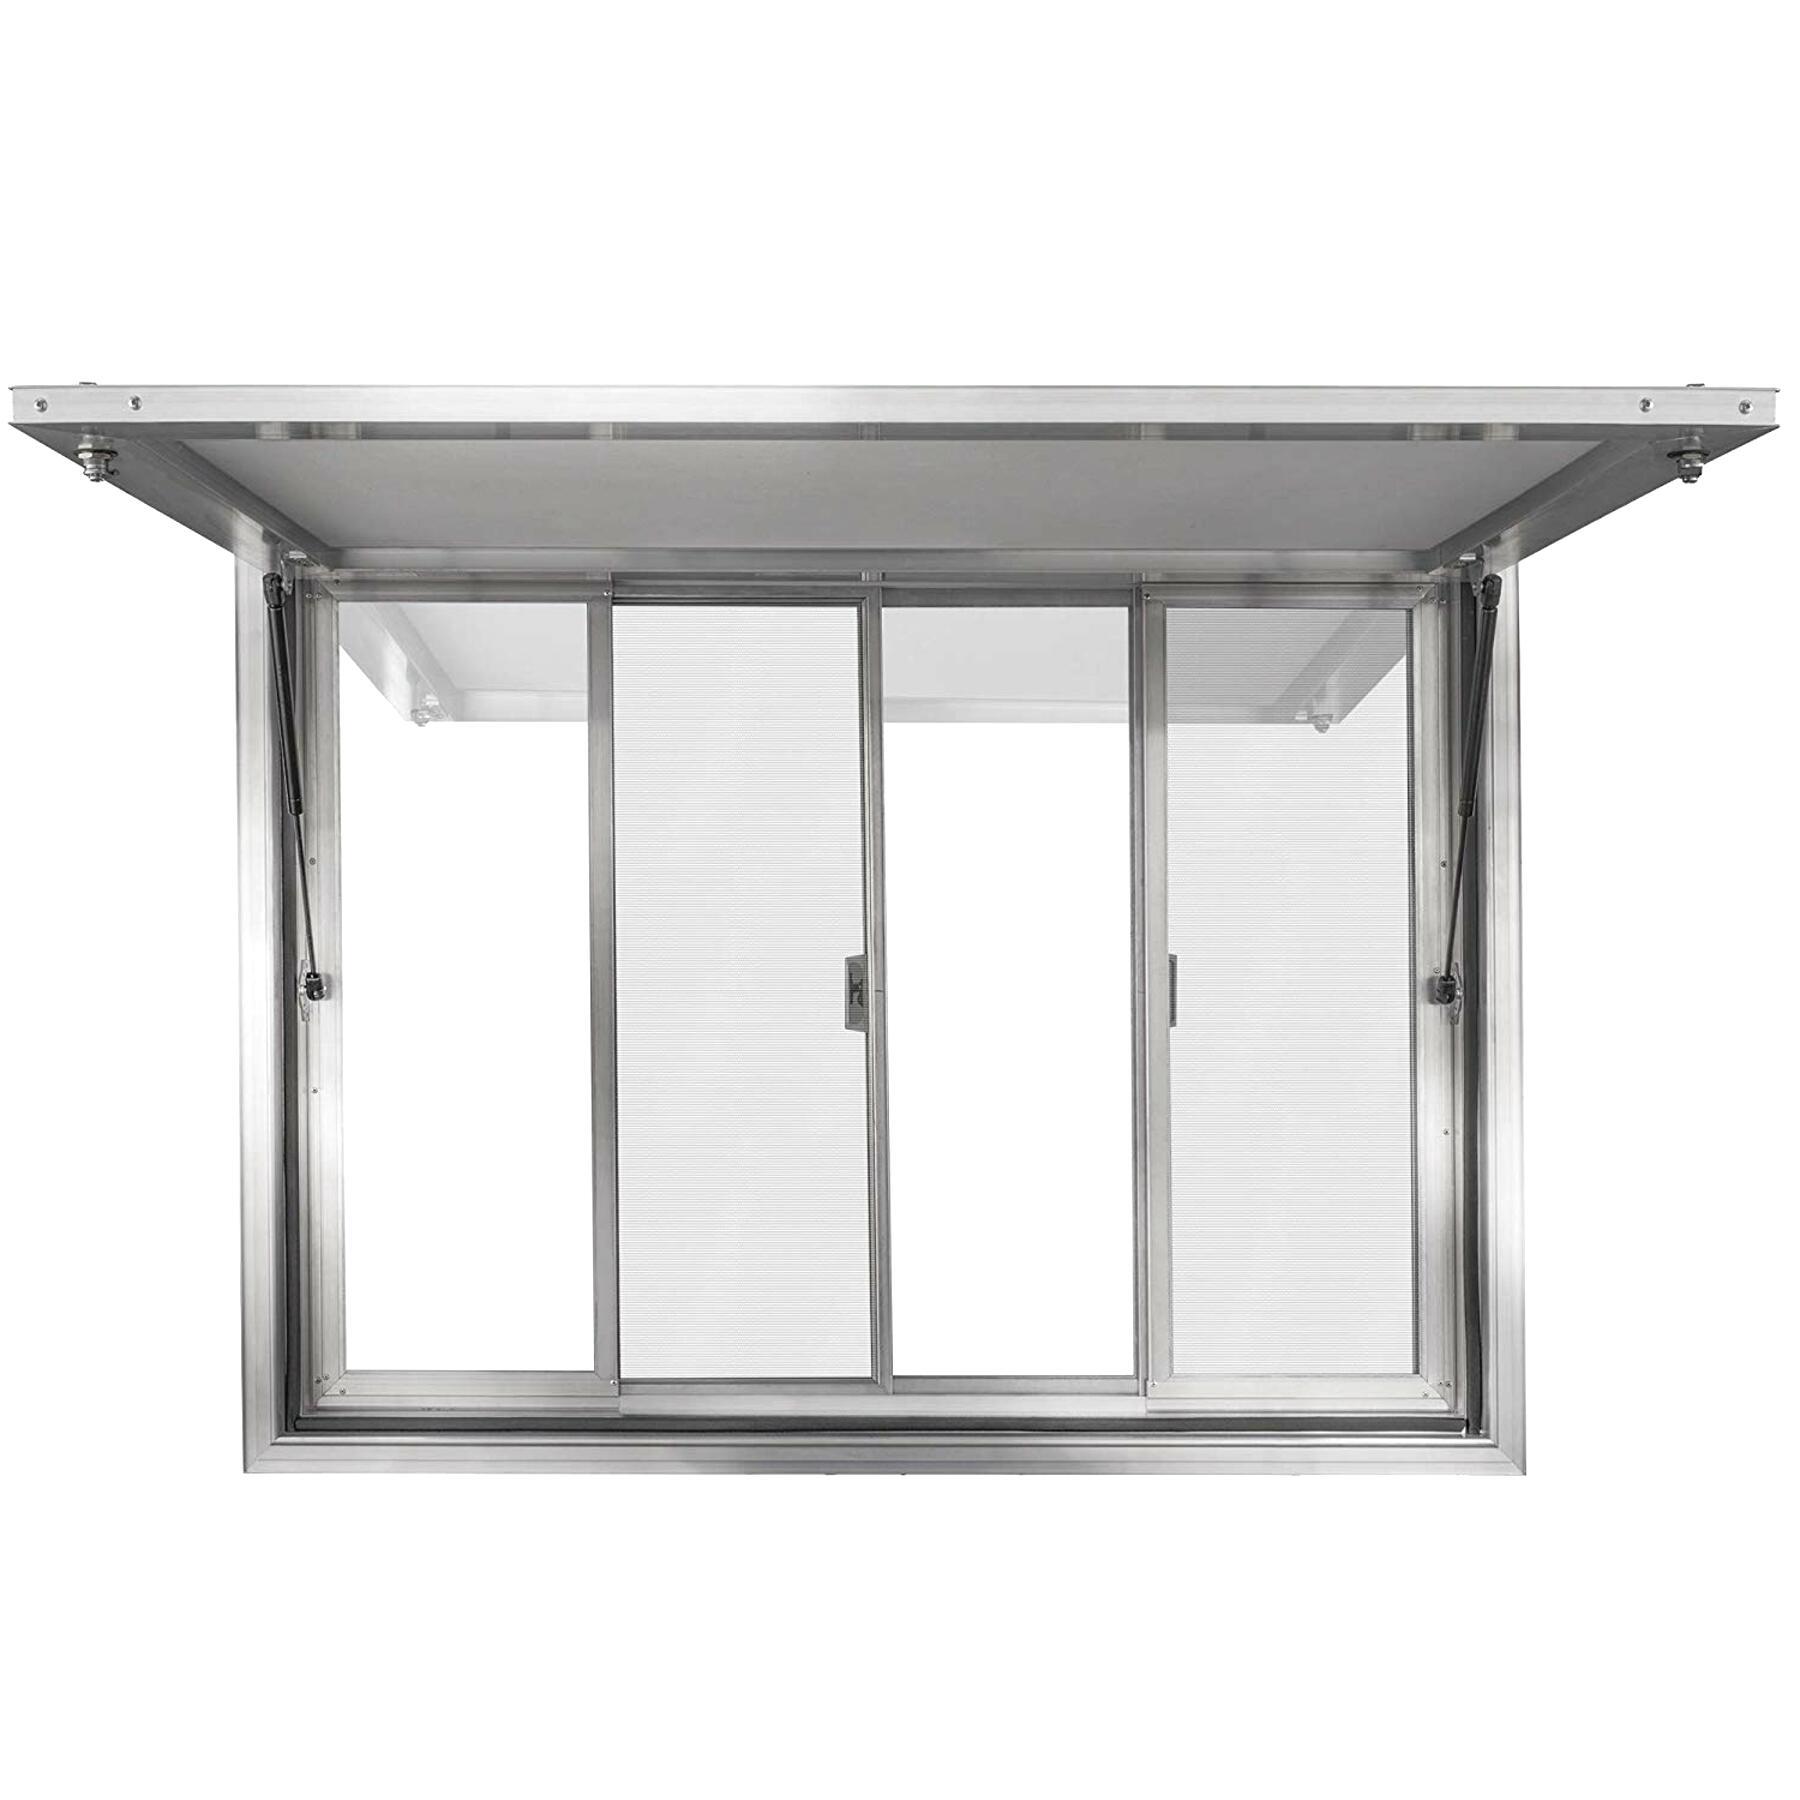 concession trailer windows for sale